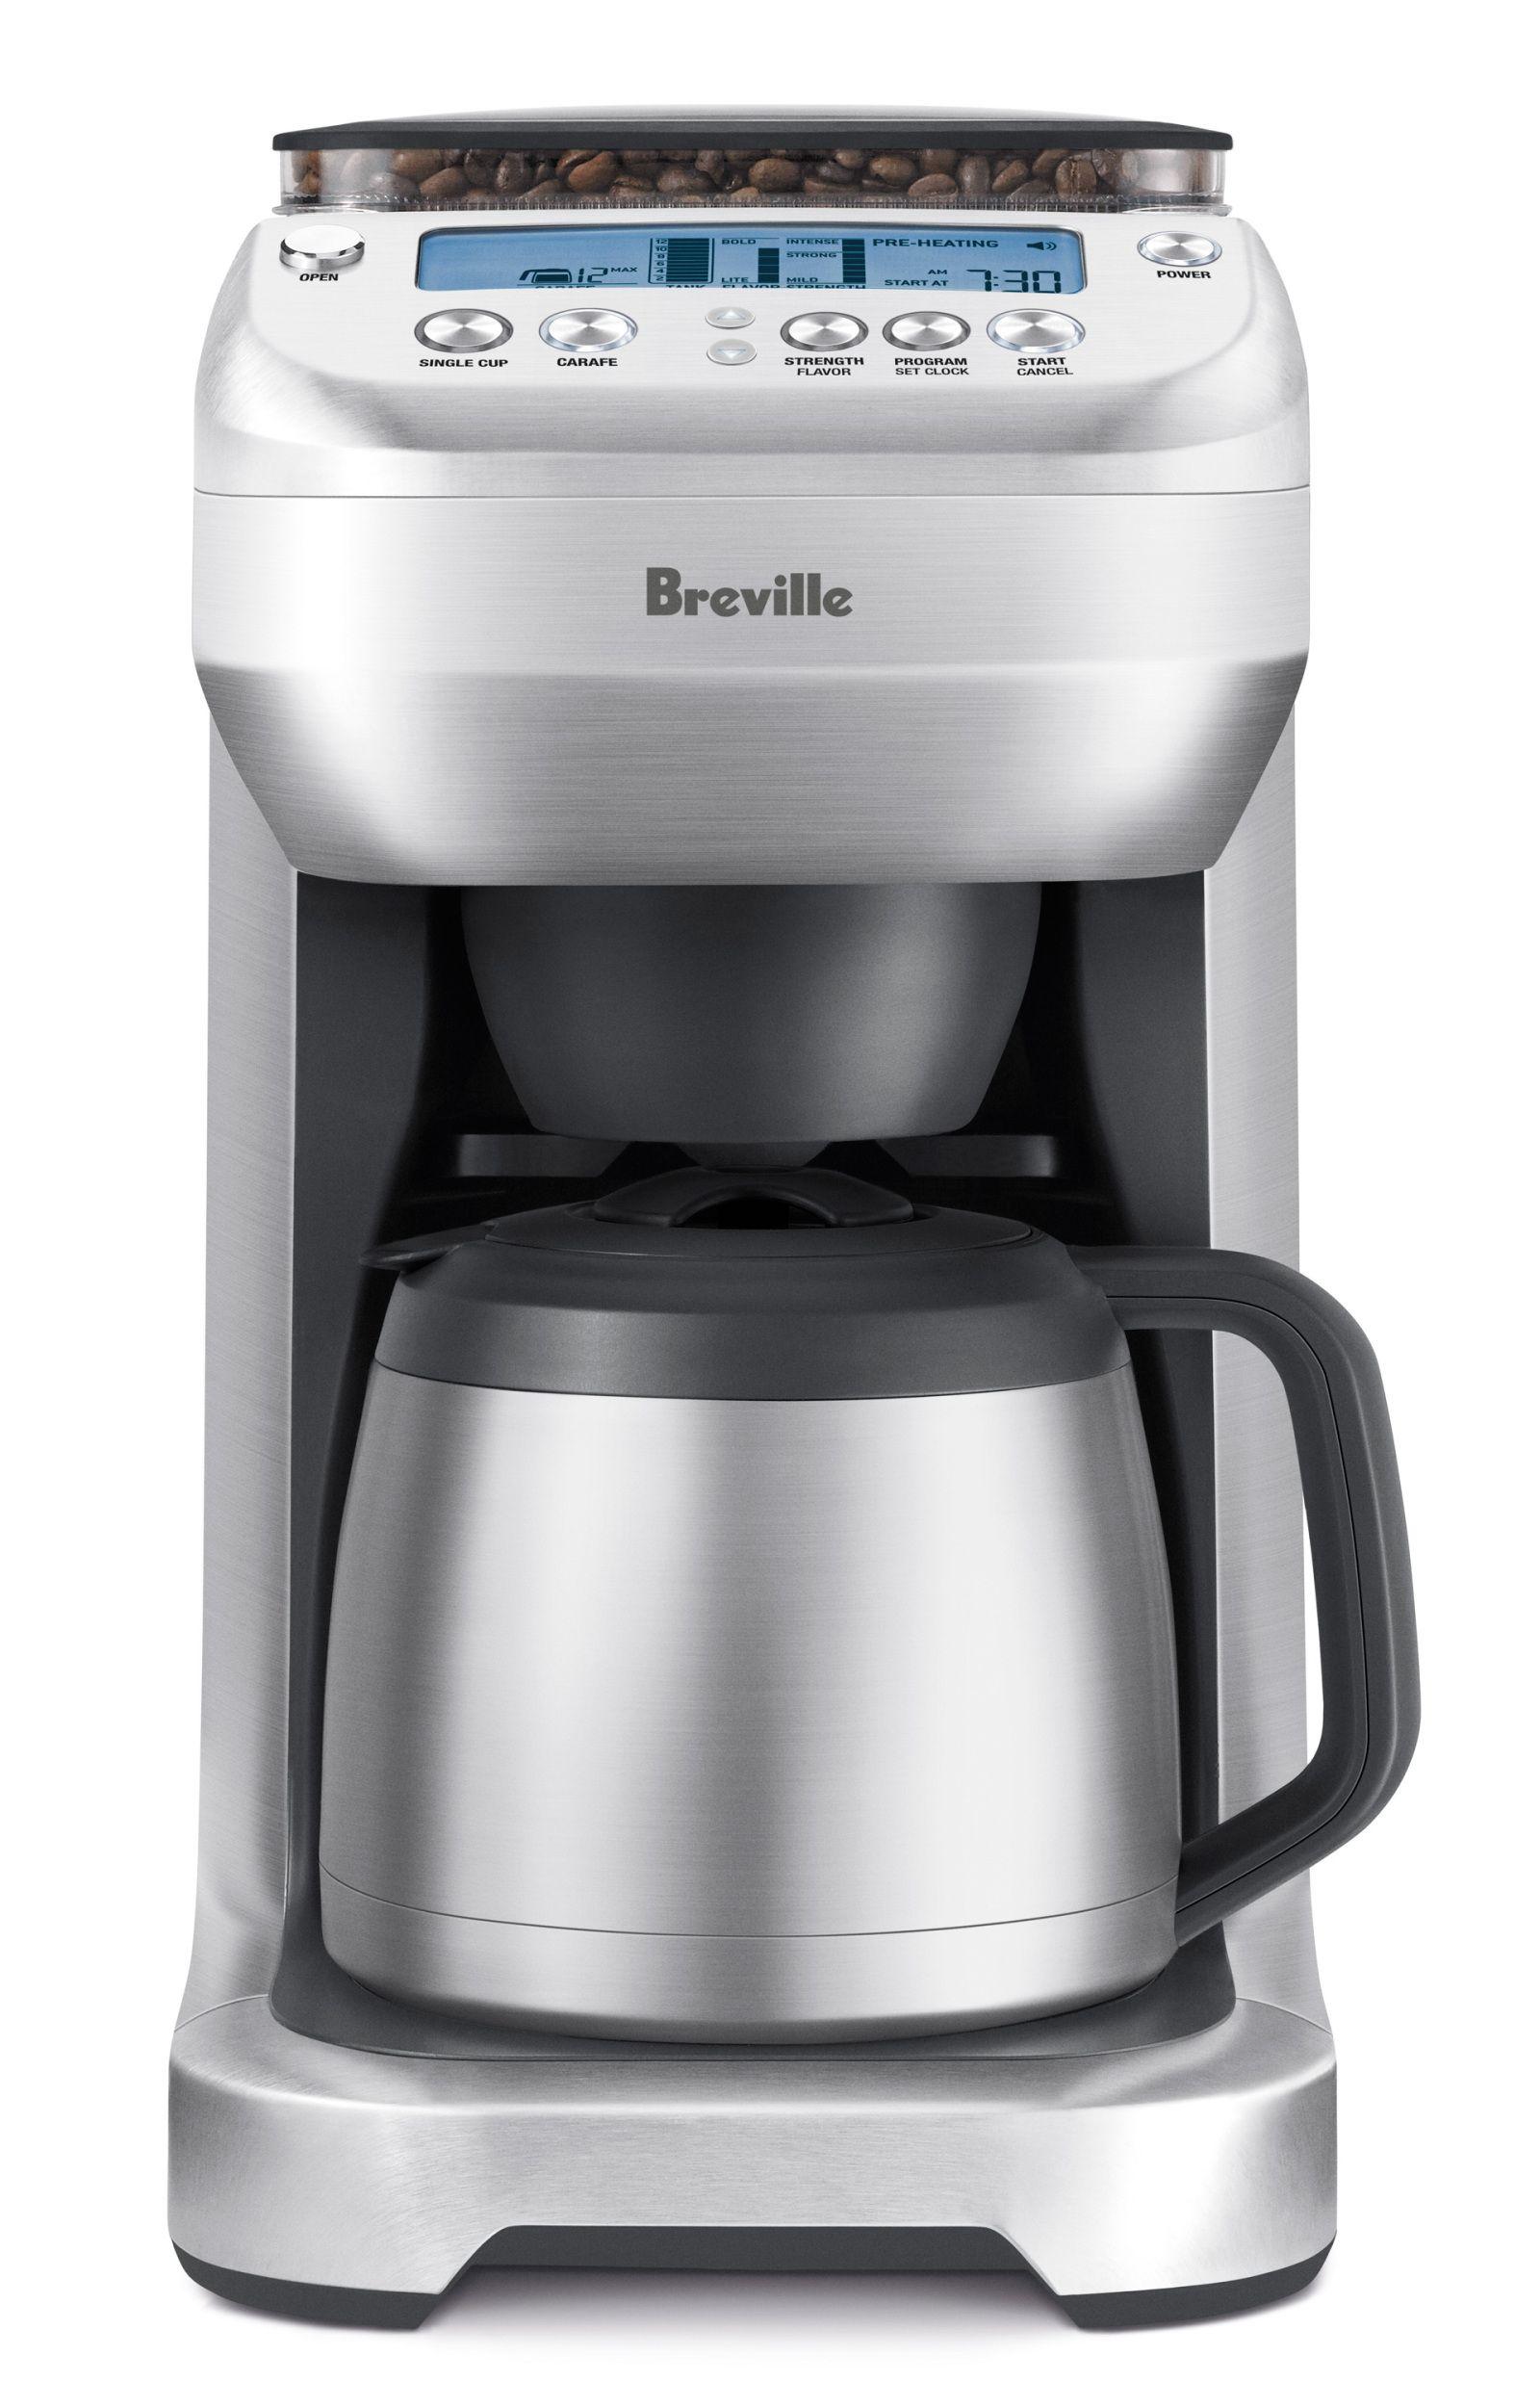 Breville YouBrew Carafe Coffee, espresso maker, Single